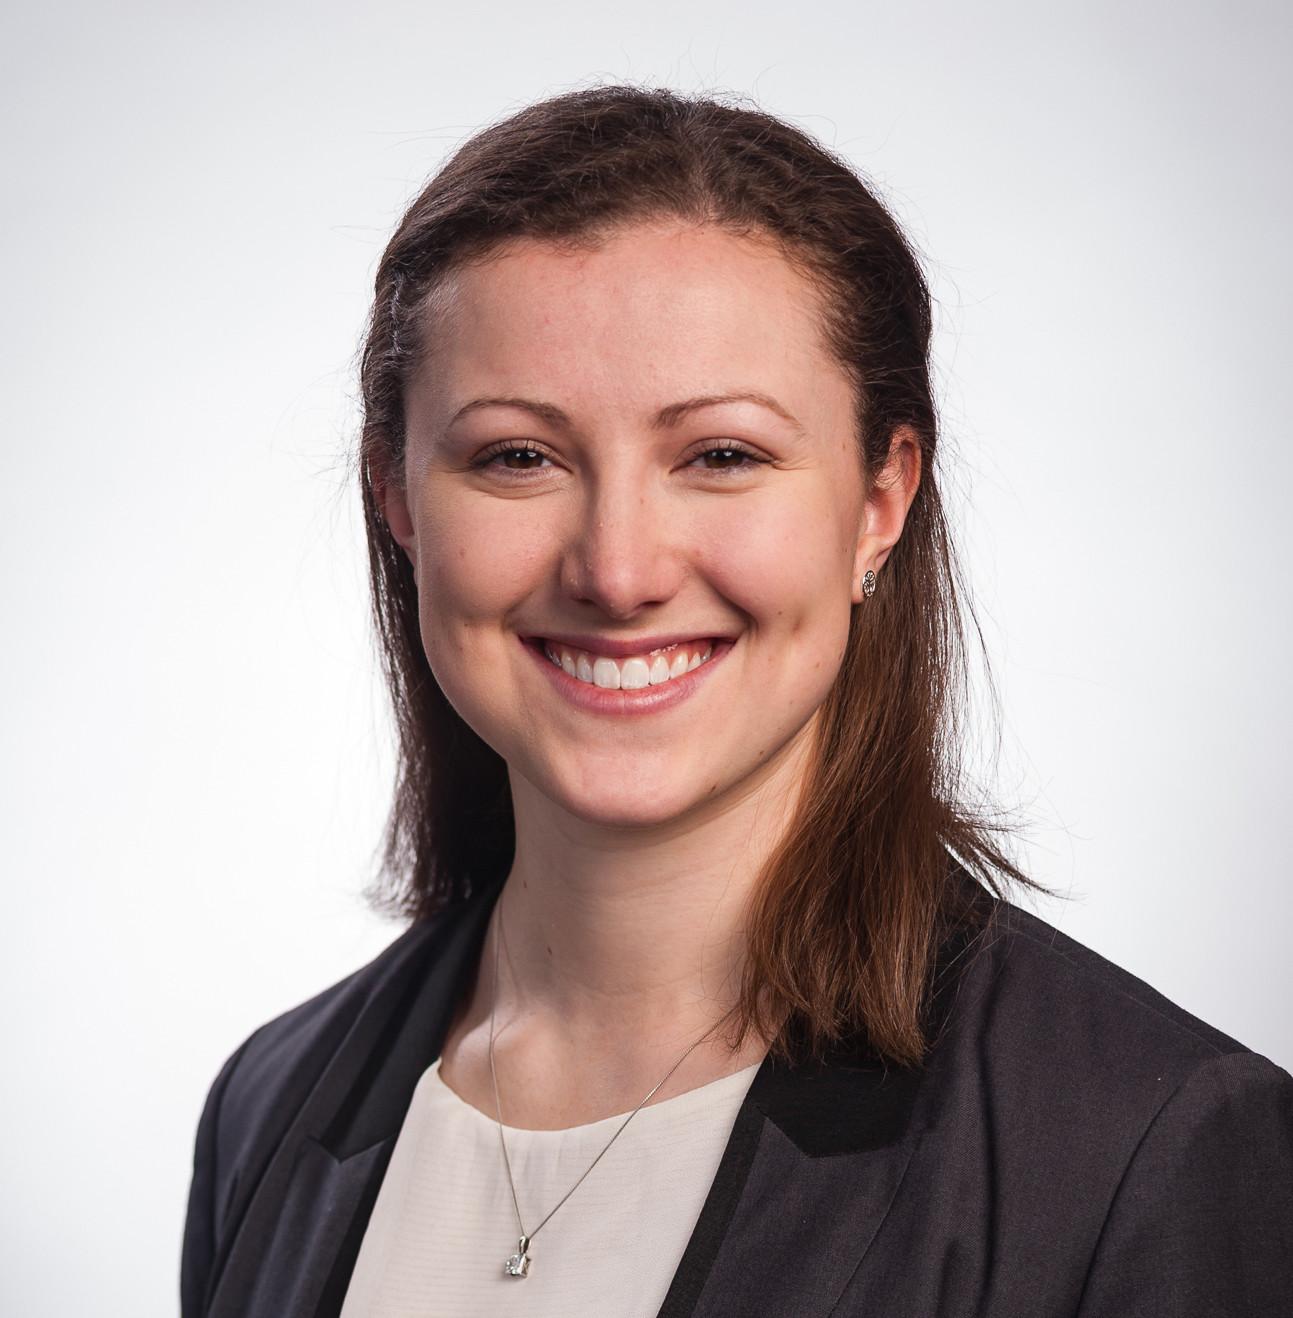 Sarah Wilkie, MS's avatar